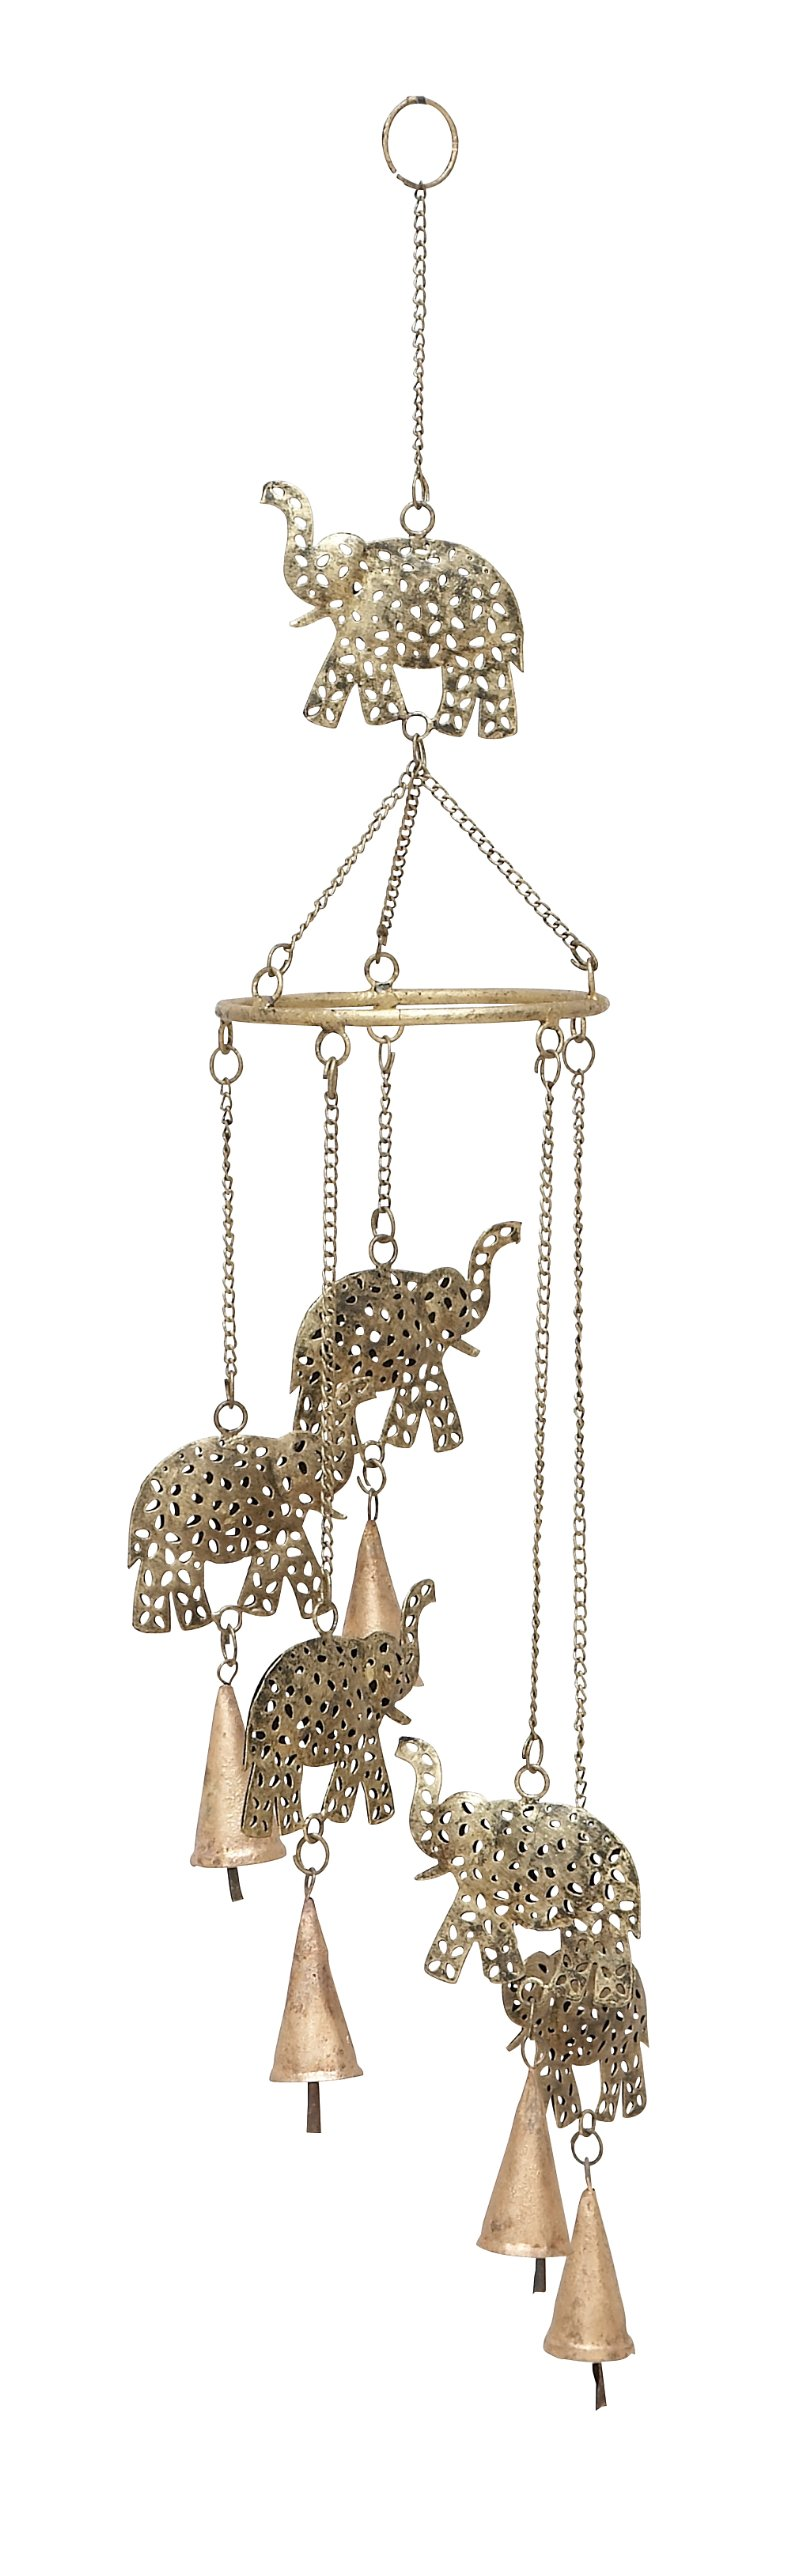 Benzara Deco 79 26717 Metal Elephant Wind Chimes 28'' H, 5'' W